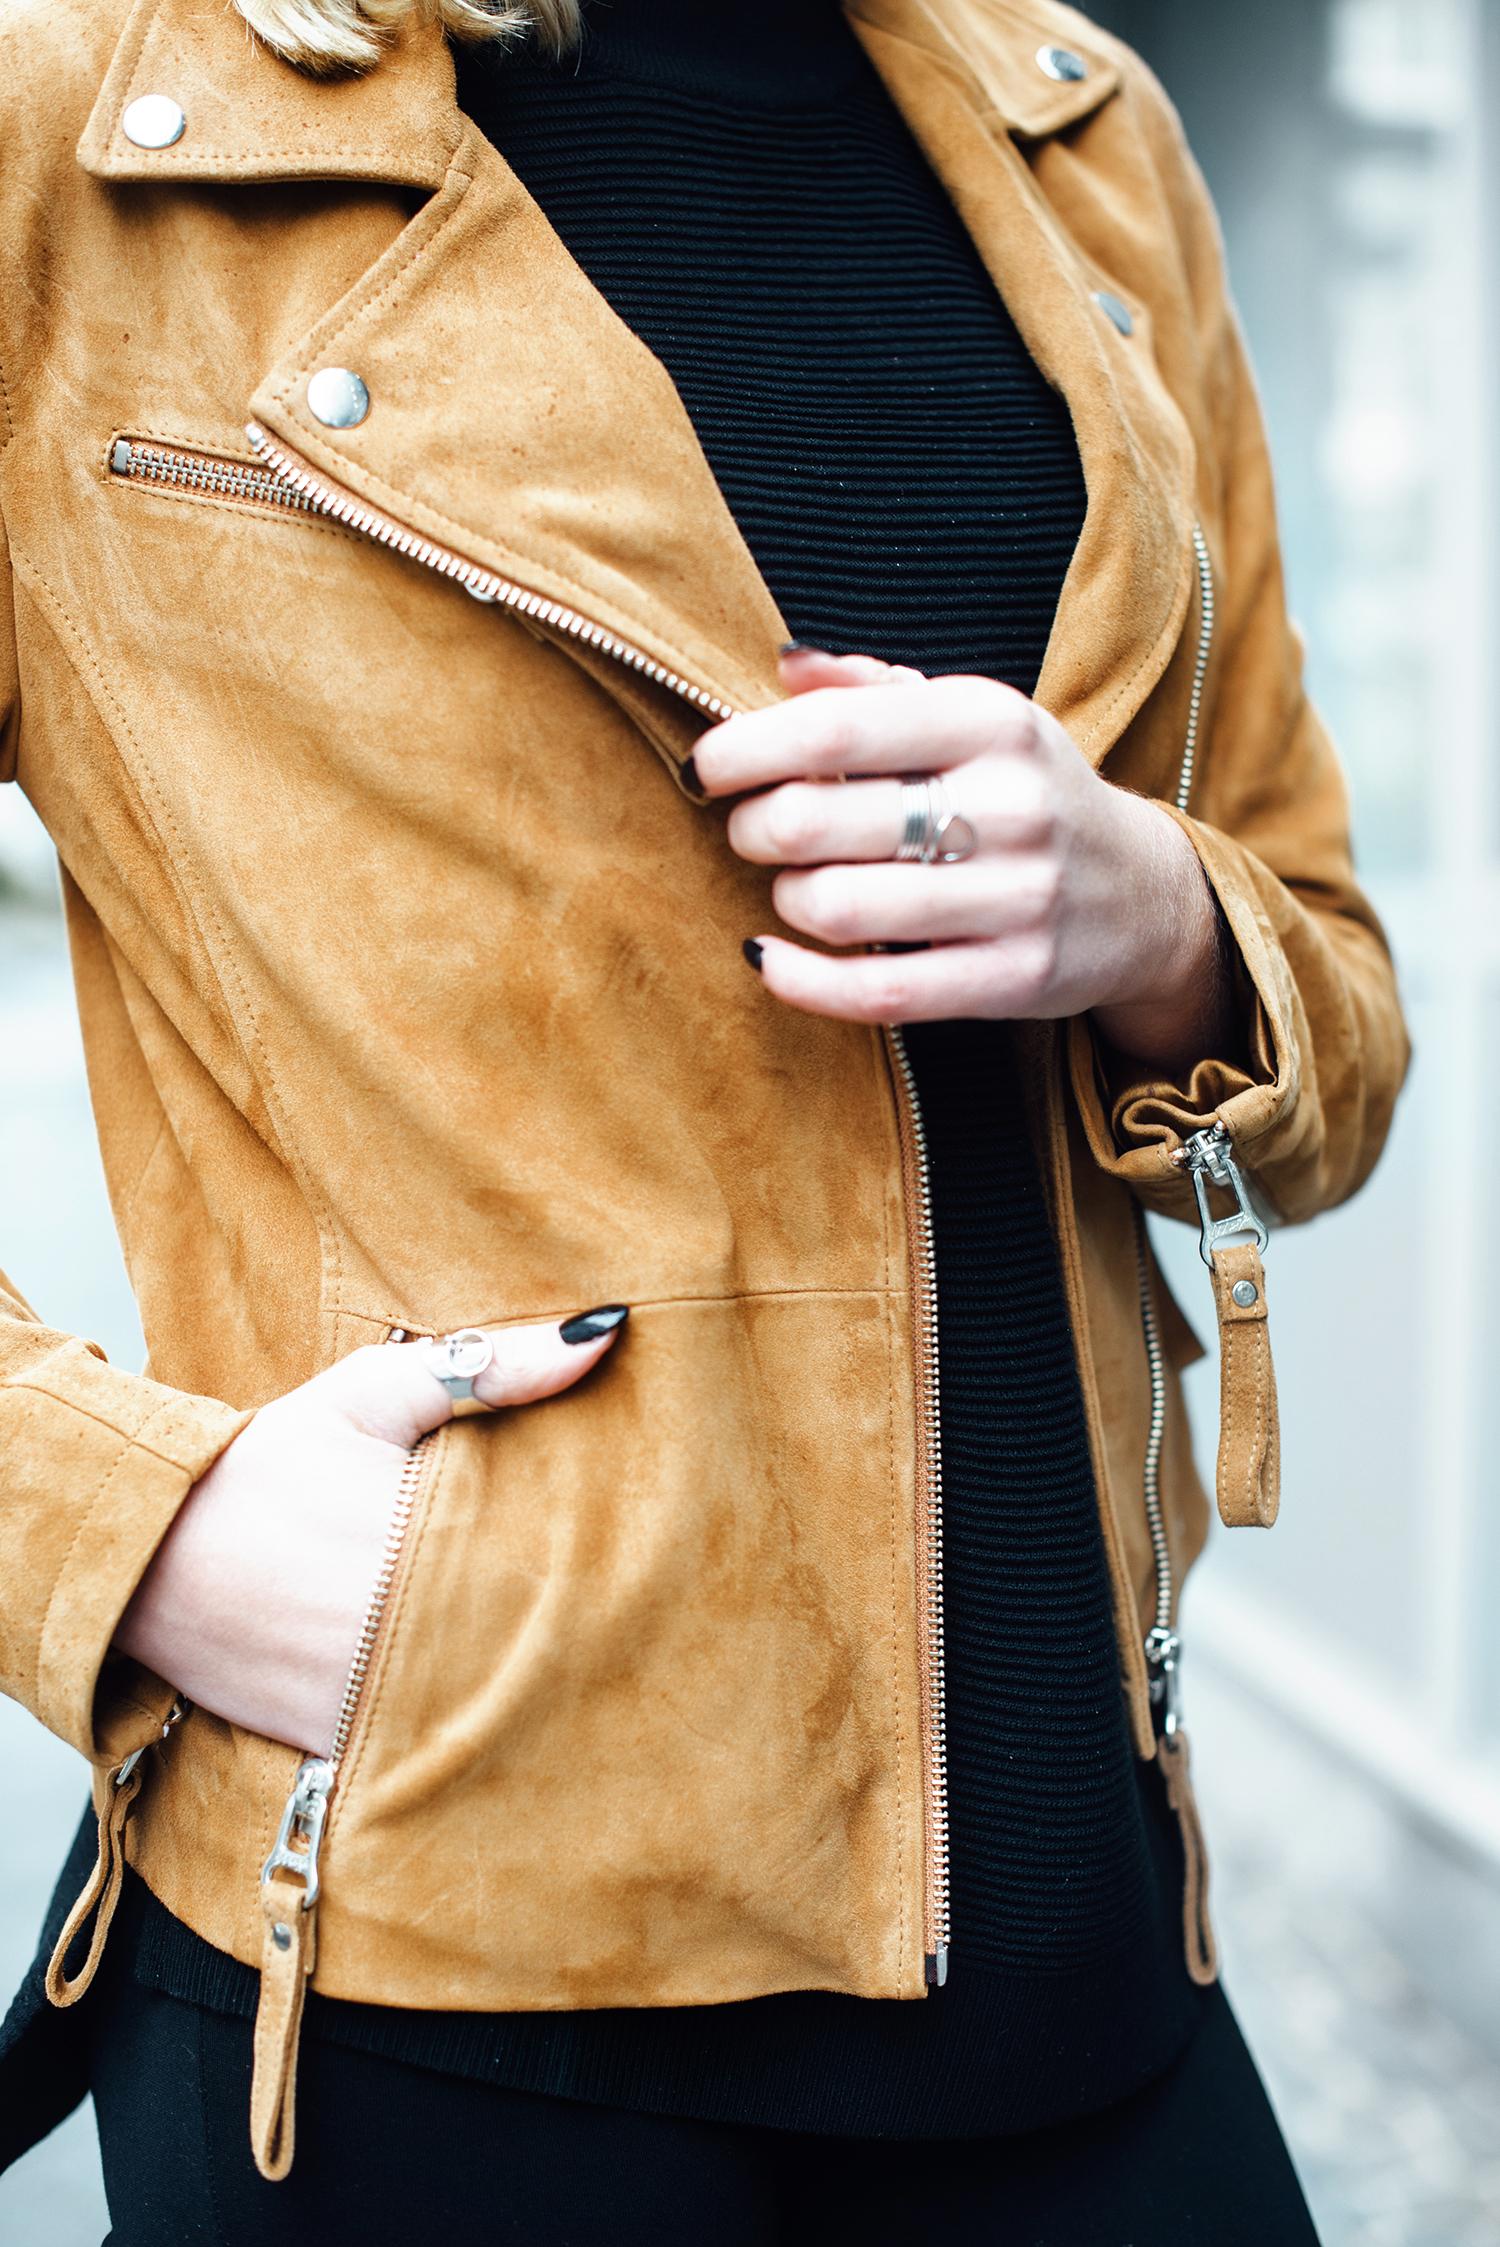 maze-lederjacke-braun_emu-australia-schuhe-lamfell_outfit_inspiration_fashionblog_modeblog_kiamisu-3